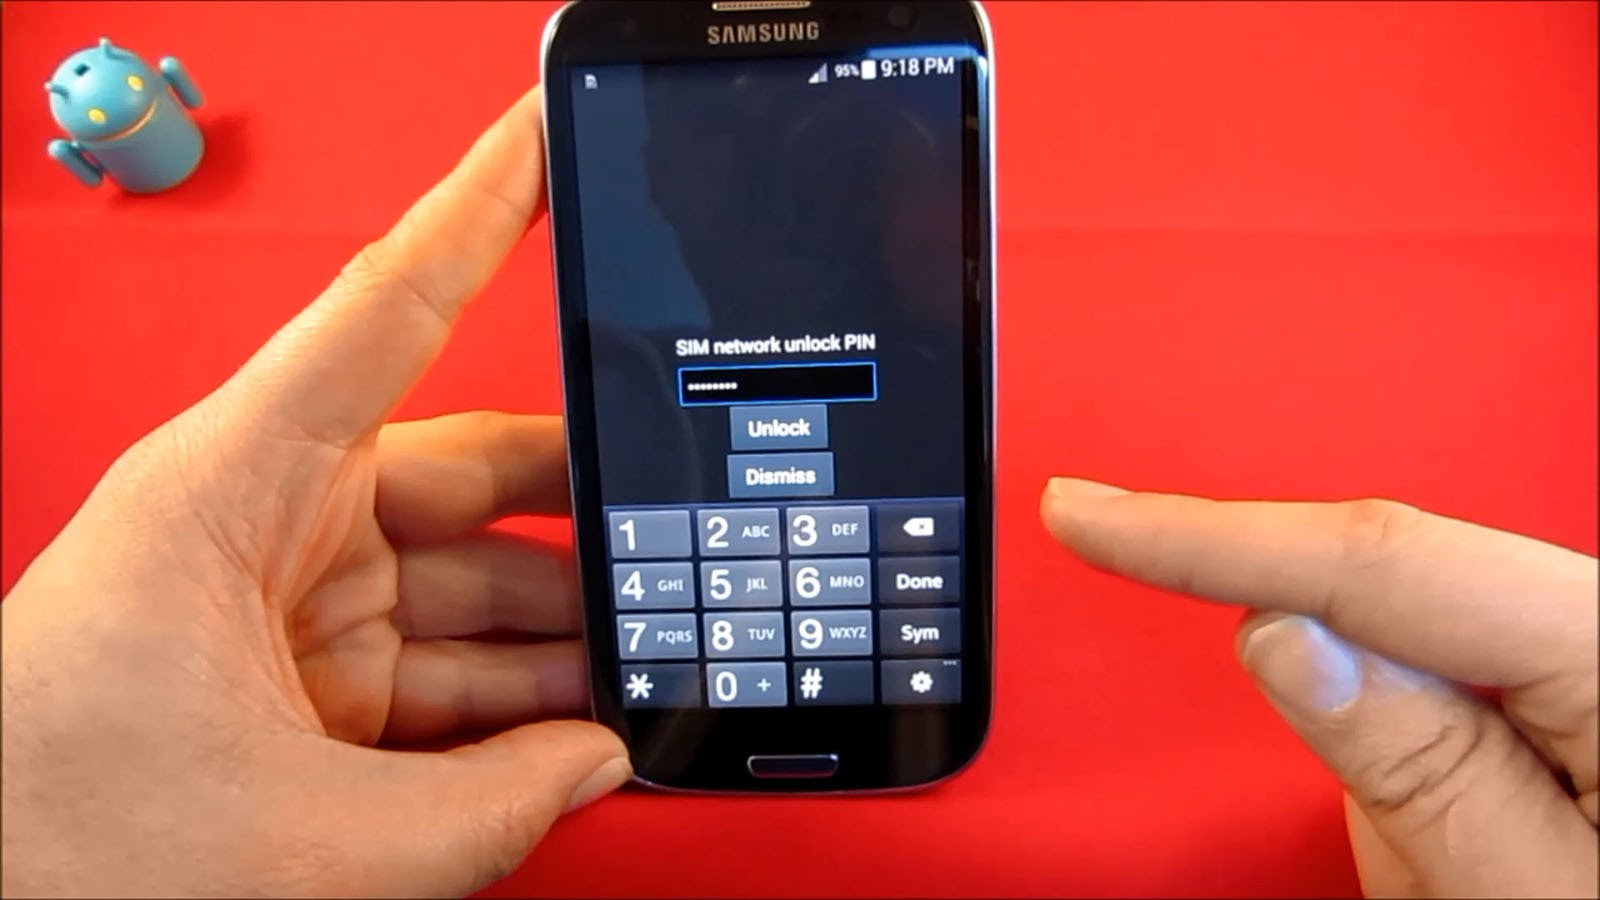 samsung galaxy s3 i9300 unlock code generator